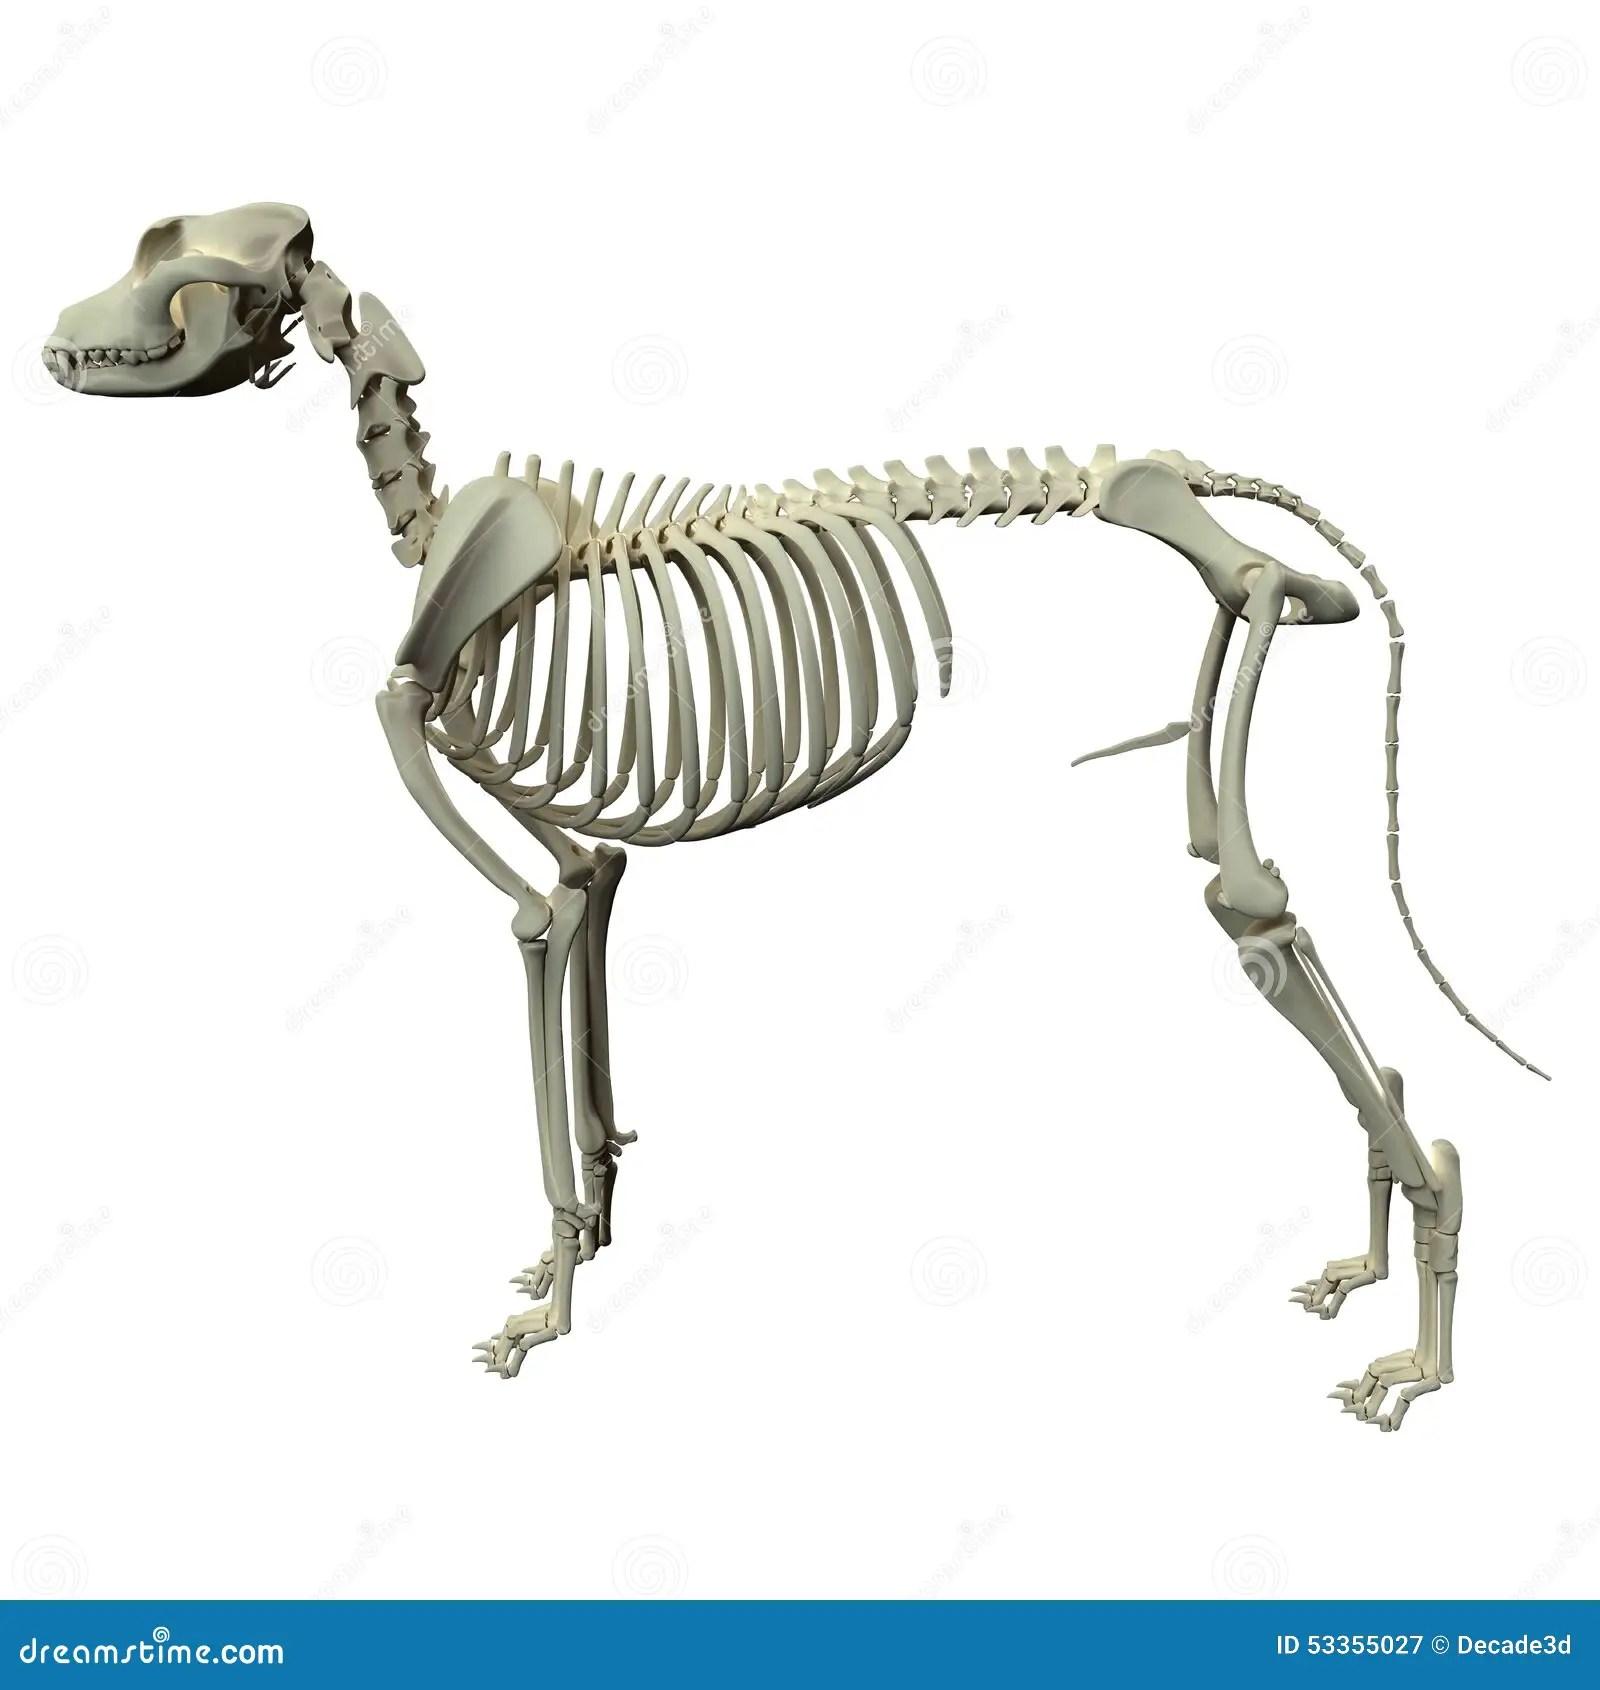 Dog Hind Legs Of A Skeleton